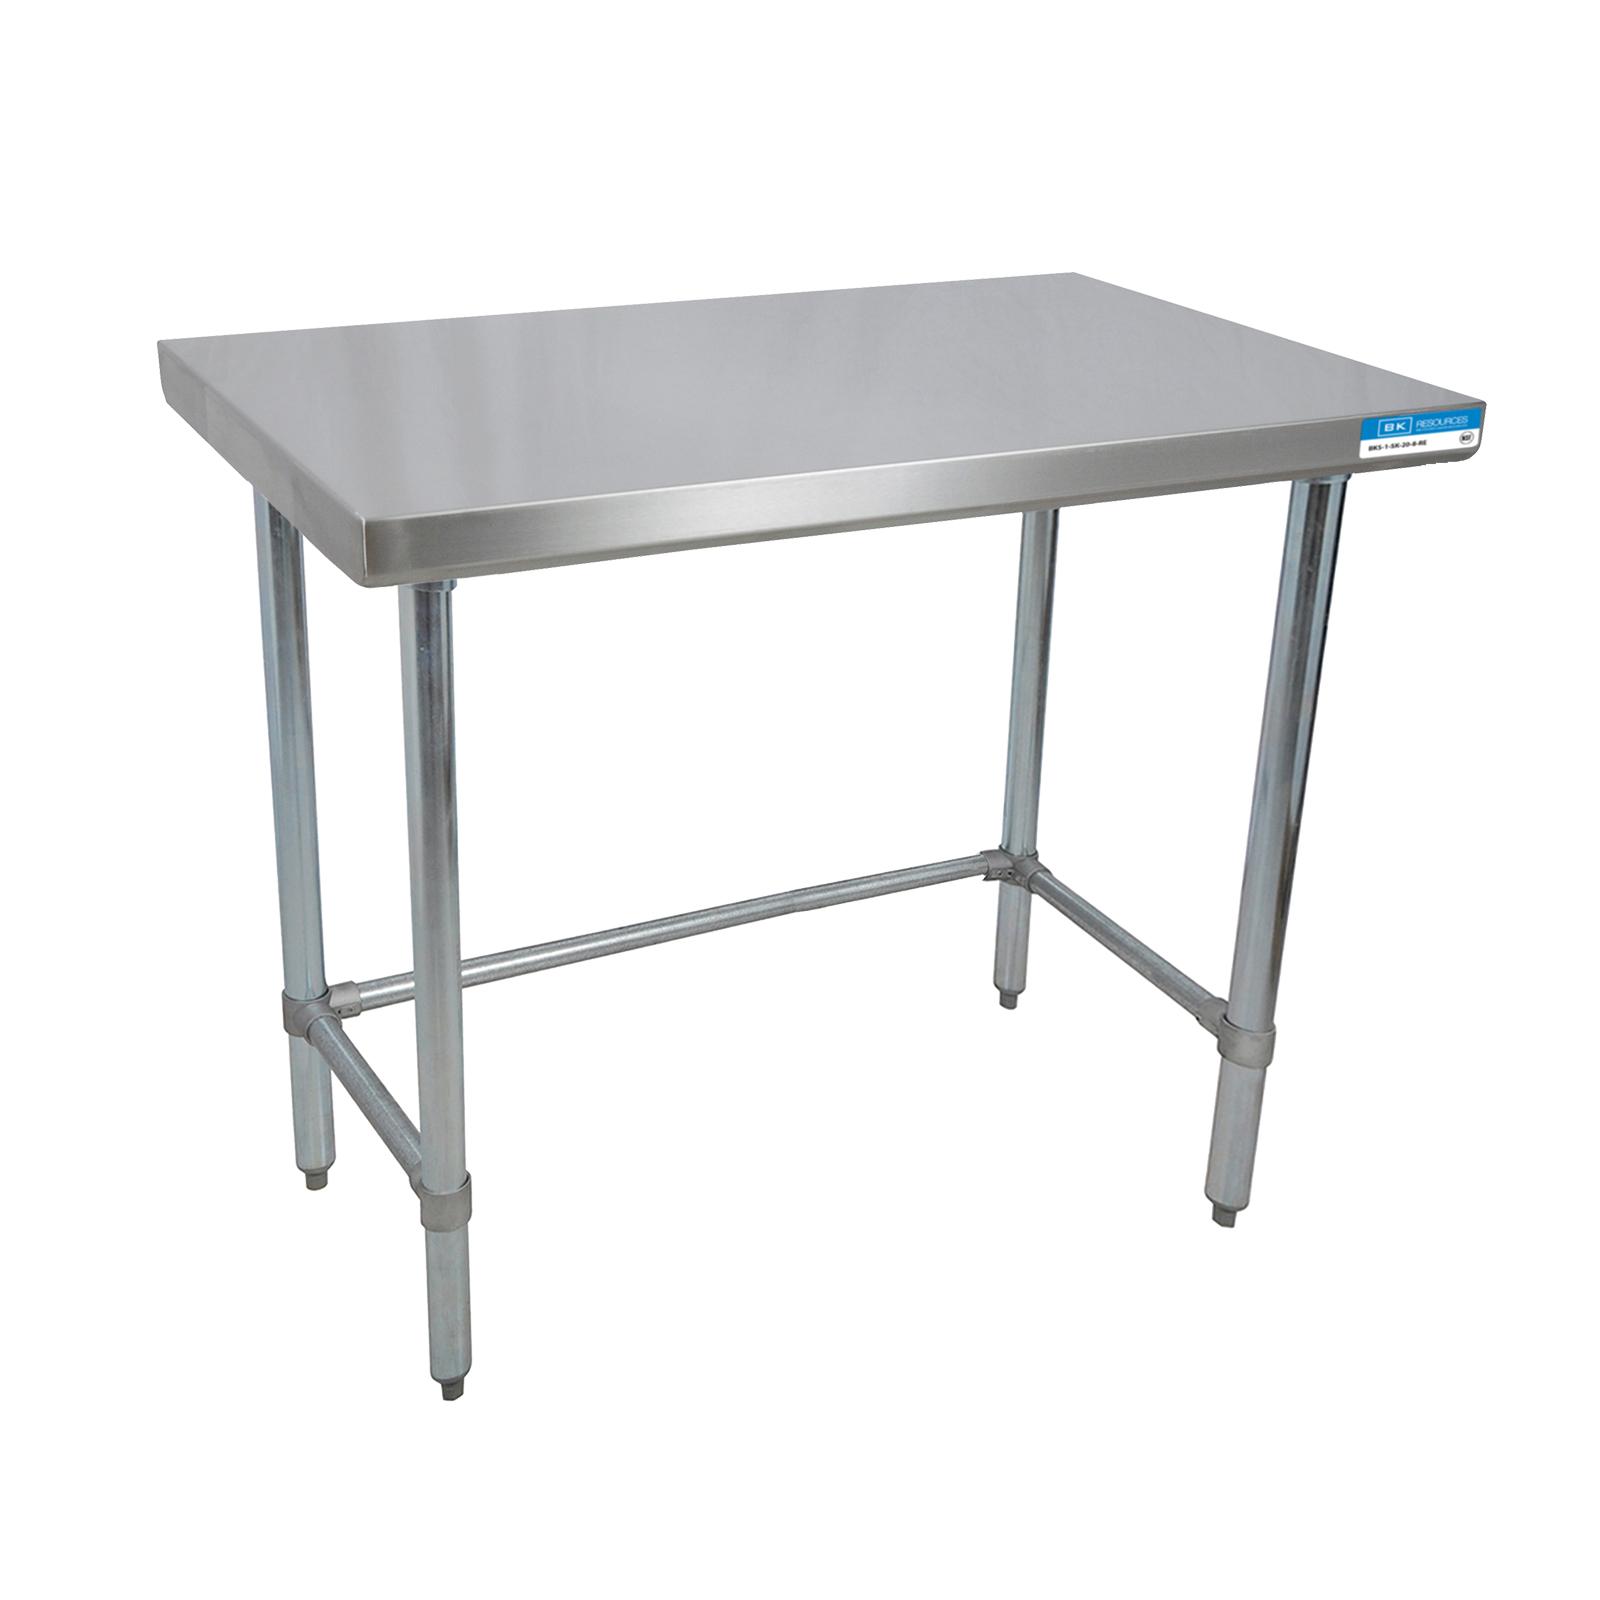 BK Resources SVTOB-1830 work table,  30